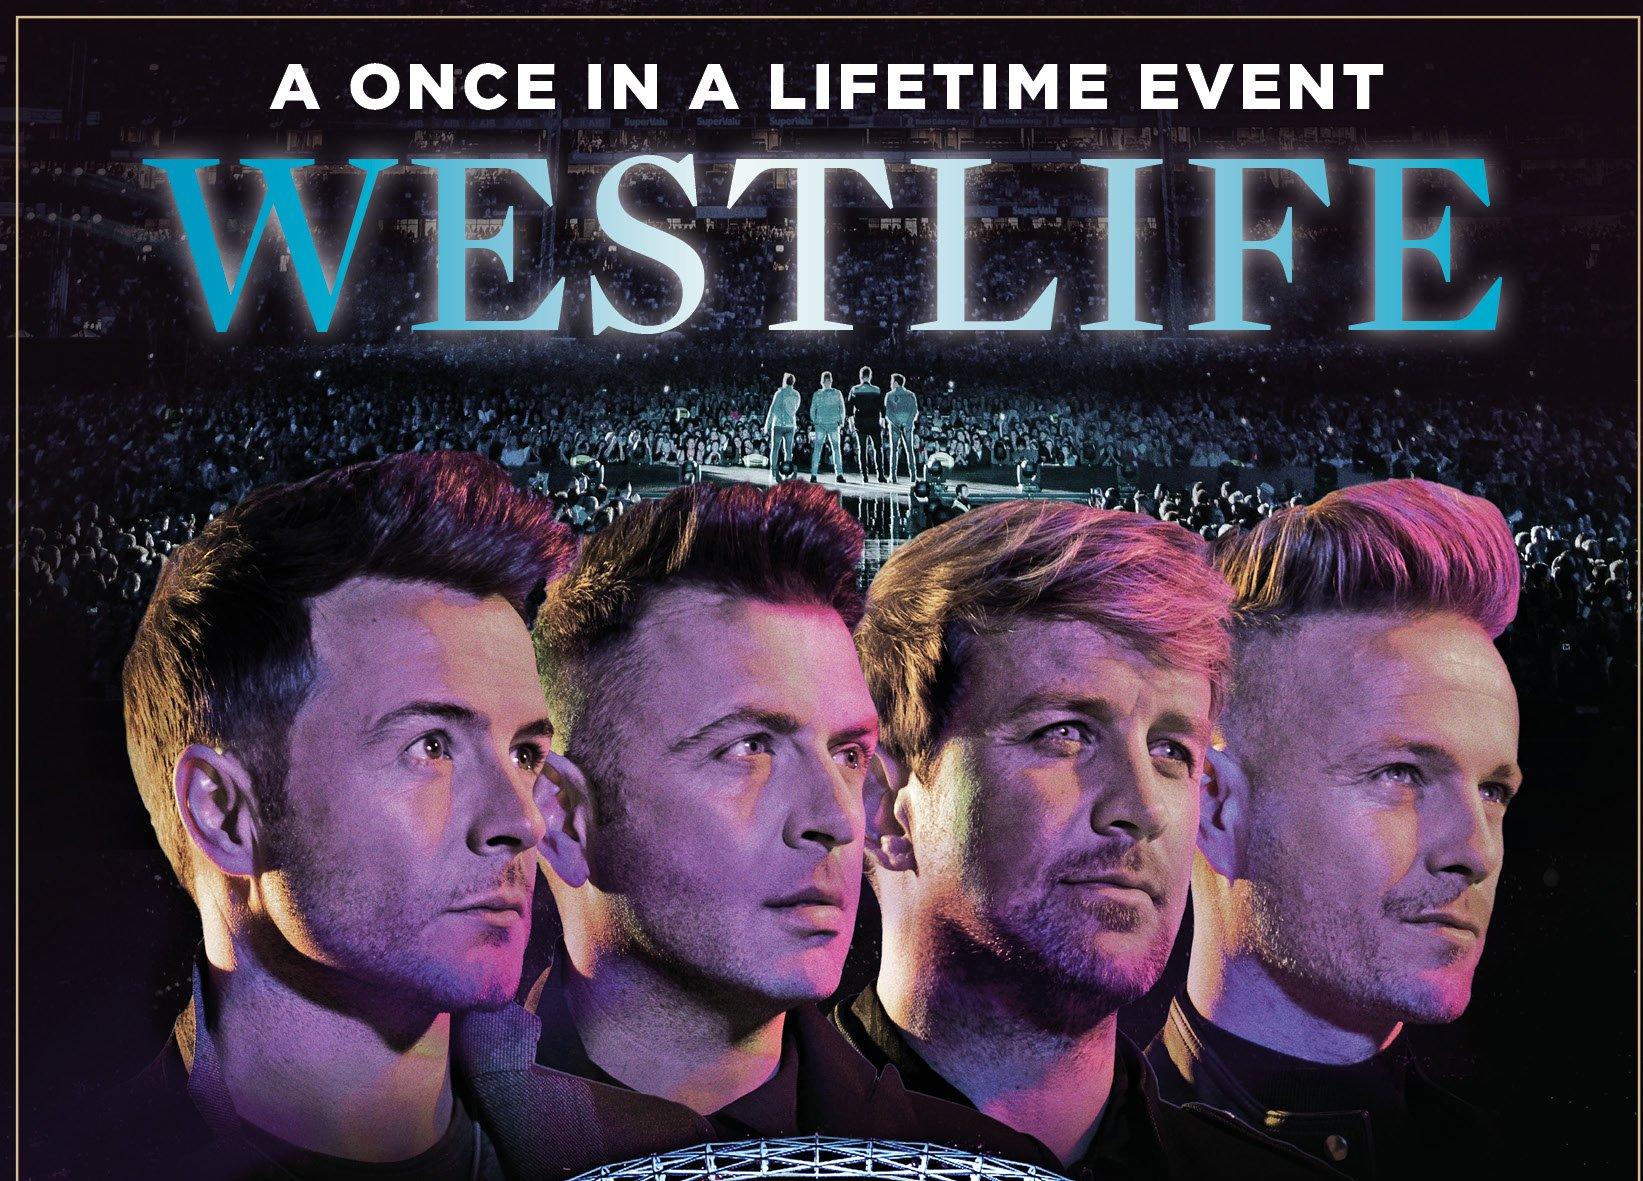 Westlife Concert Wembley Stadium